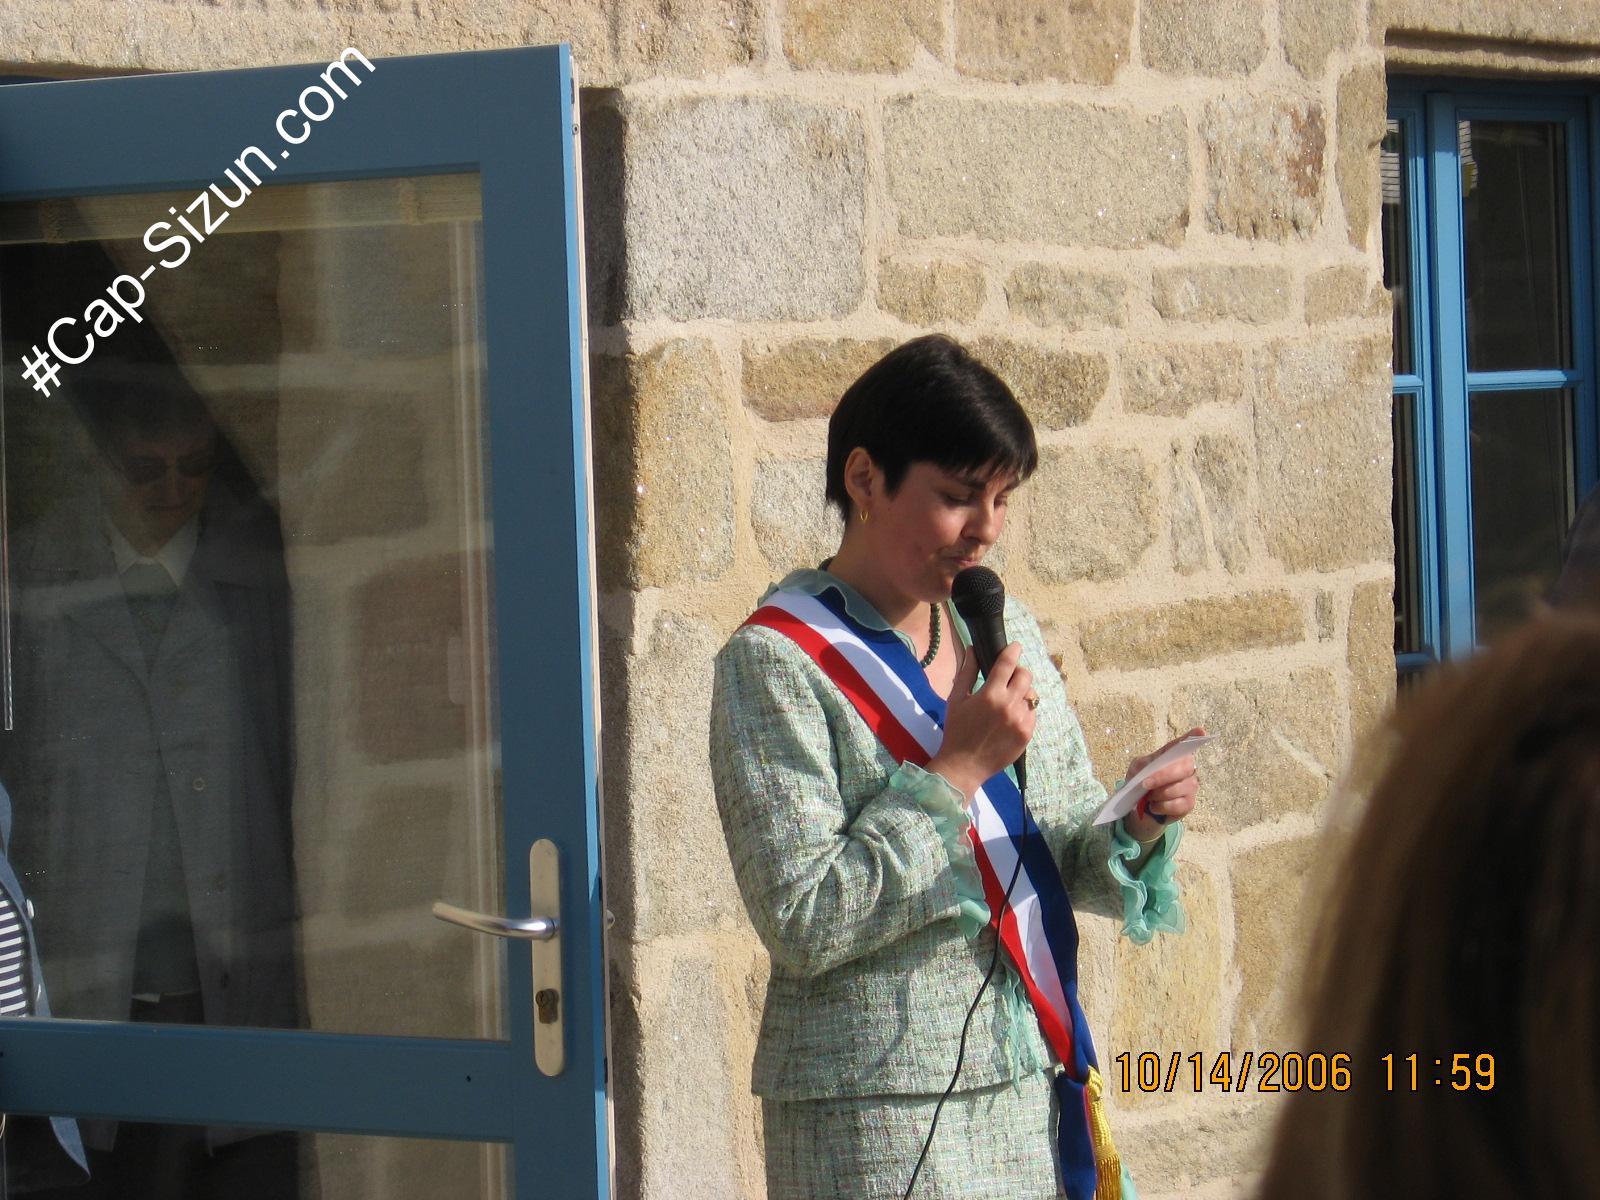 452-inauguration-de-la-mairie-de-cleden-cap-sizun.jpg